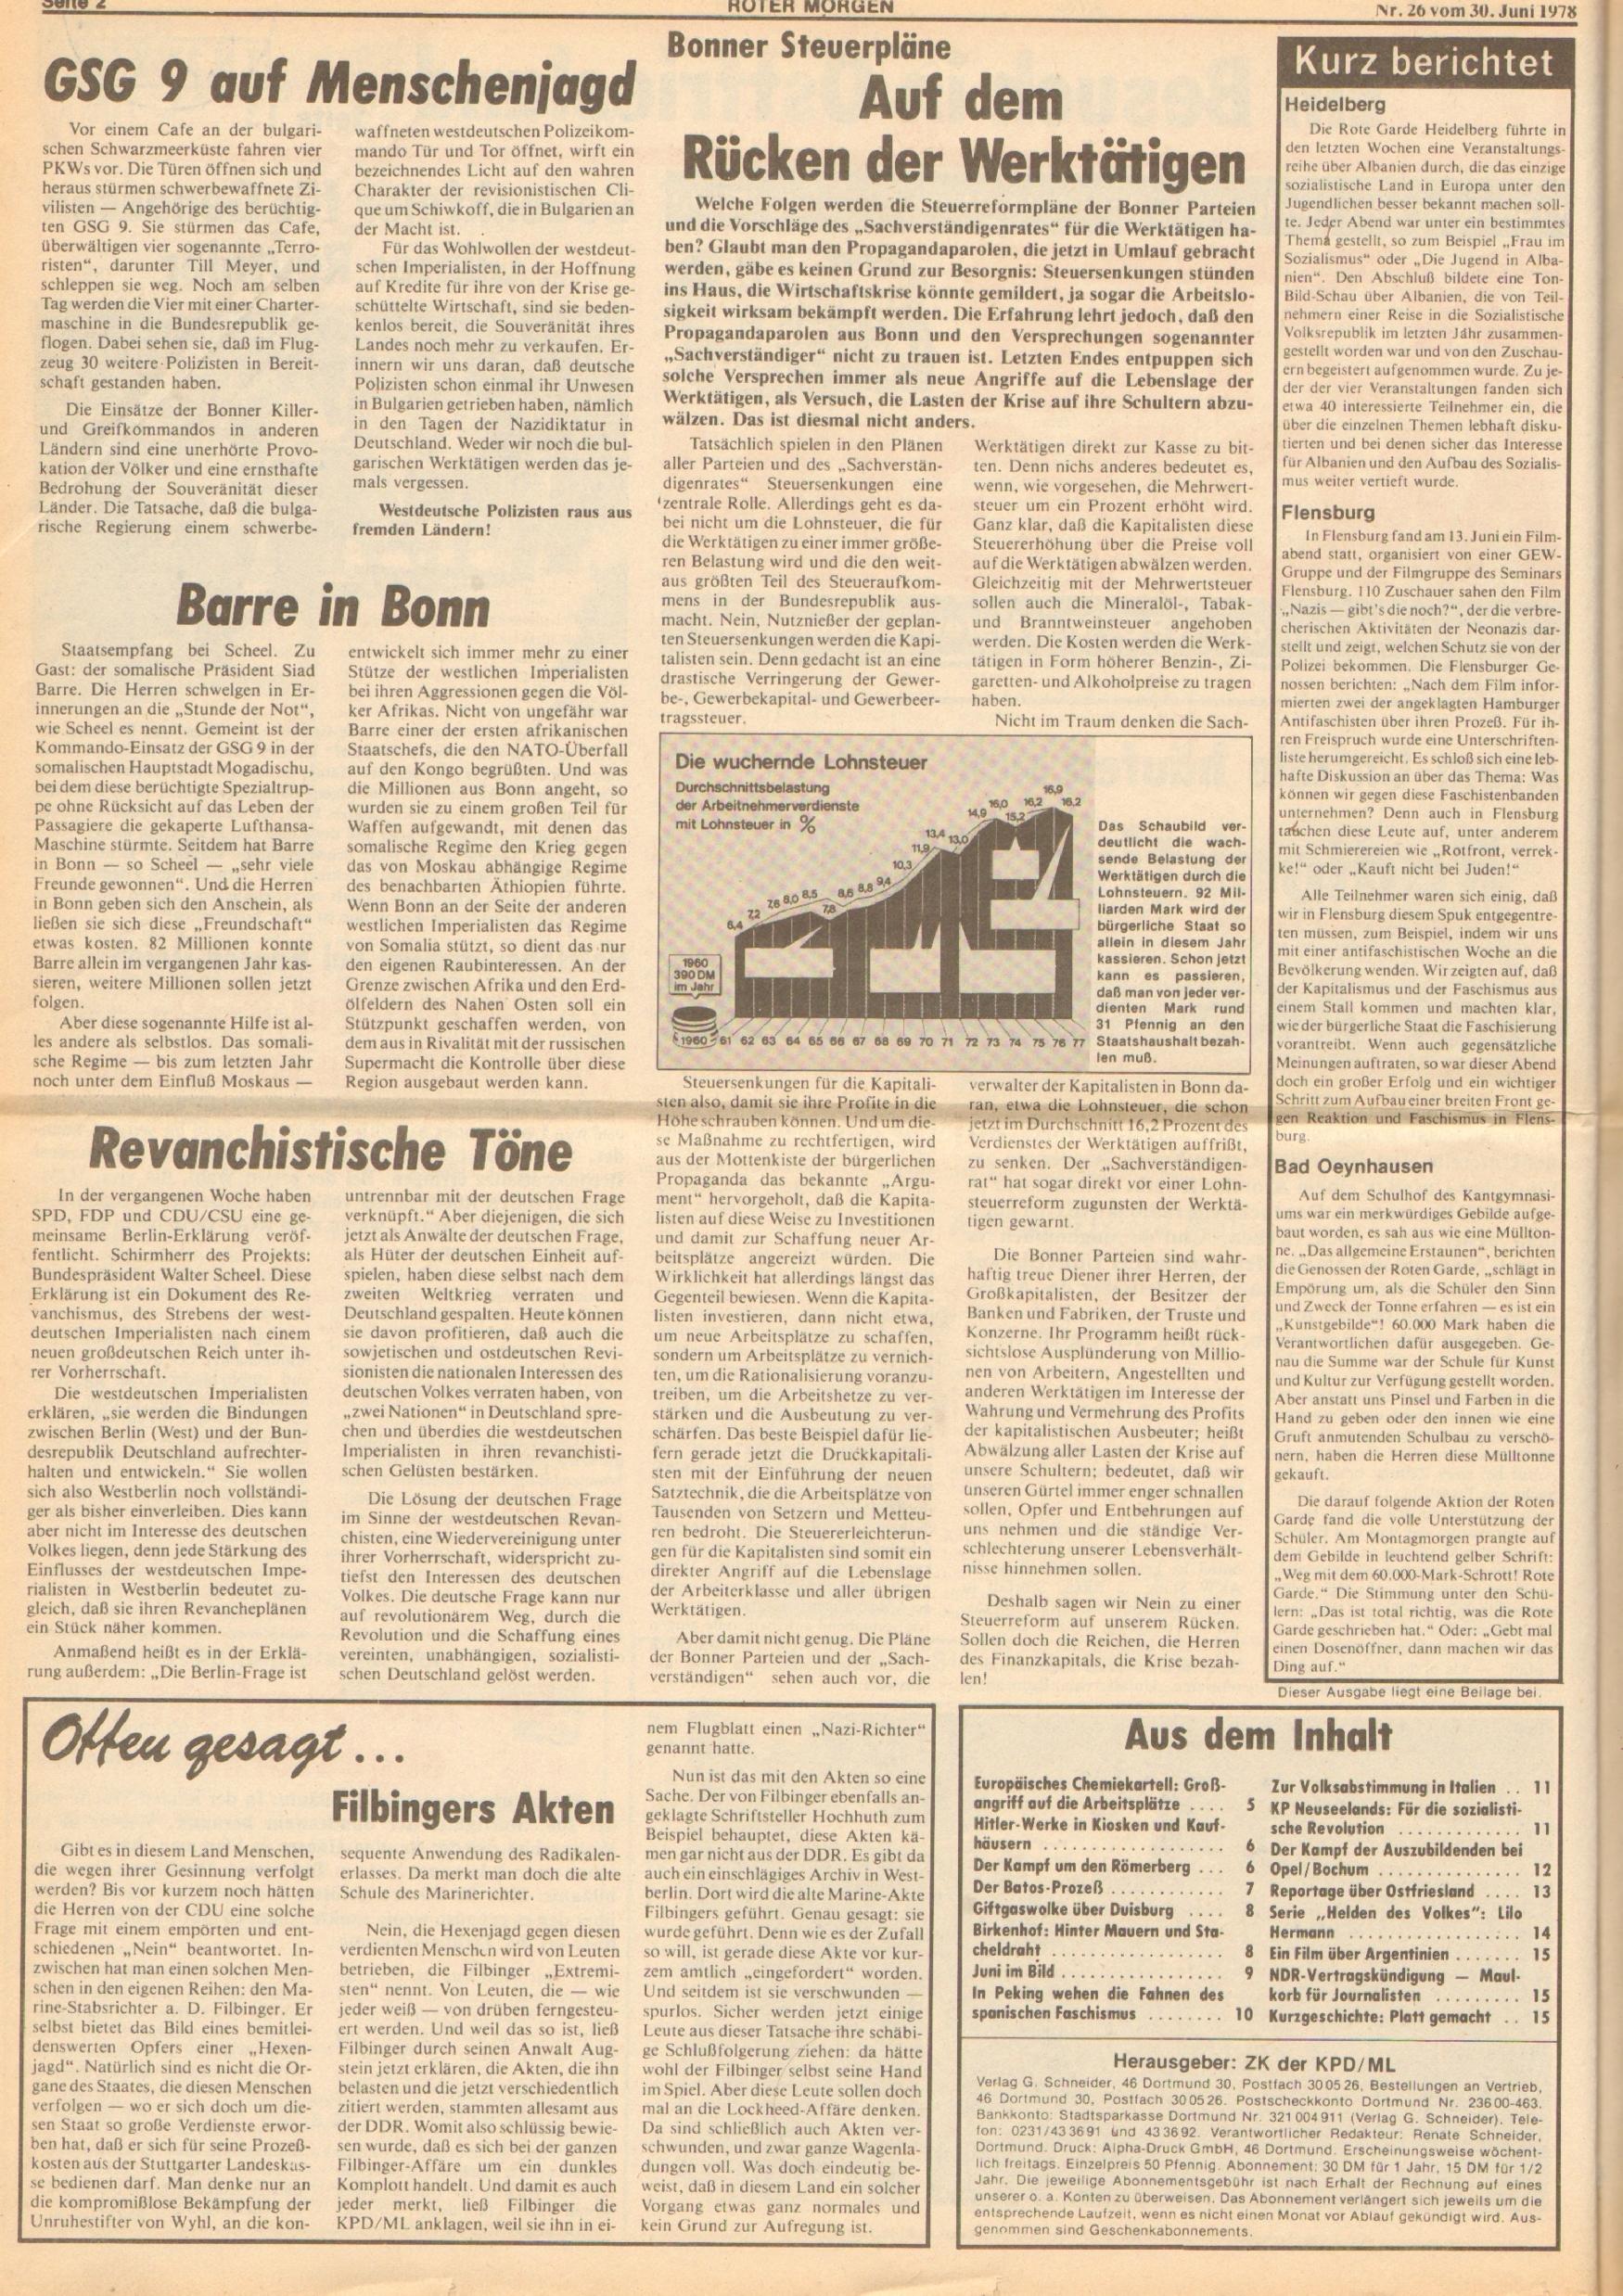 Roter Morgen, 12. Jg., 30. Juni 1978, Nr. 26, Seite 2